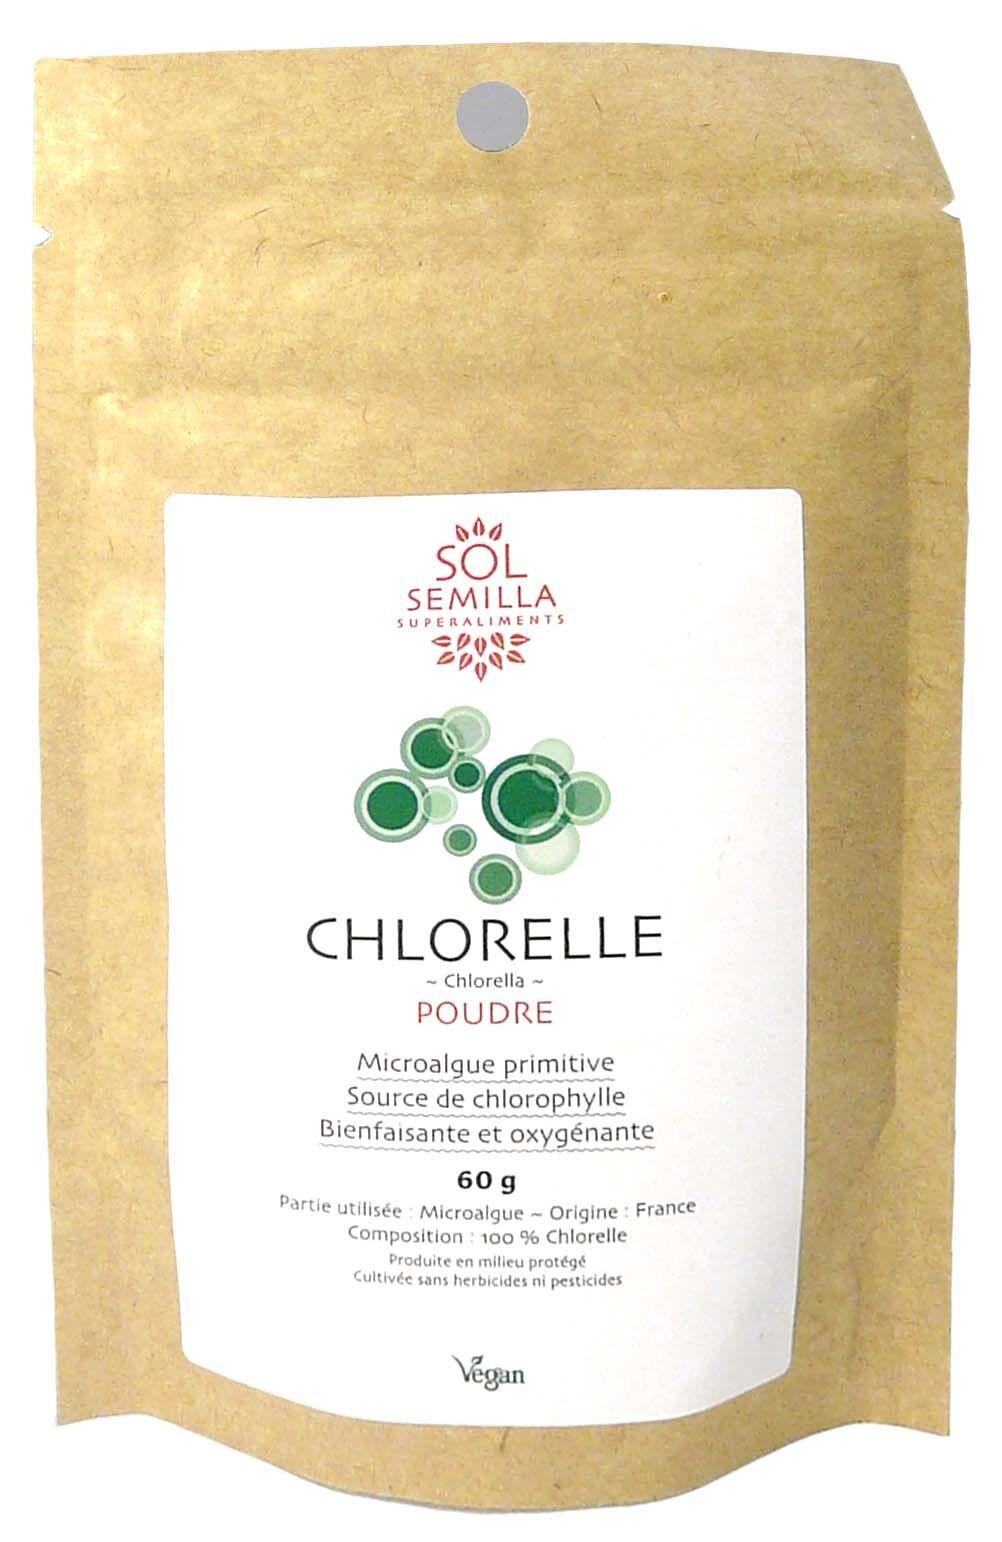 Sol semilla chlorelle poudre 60g